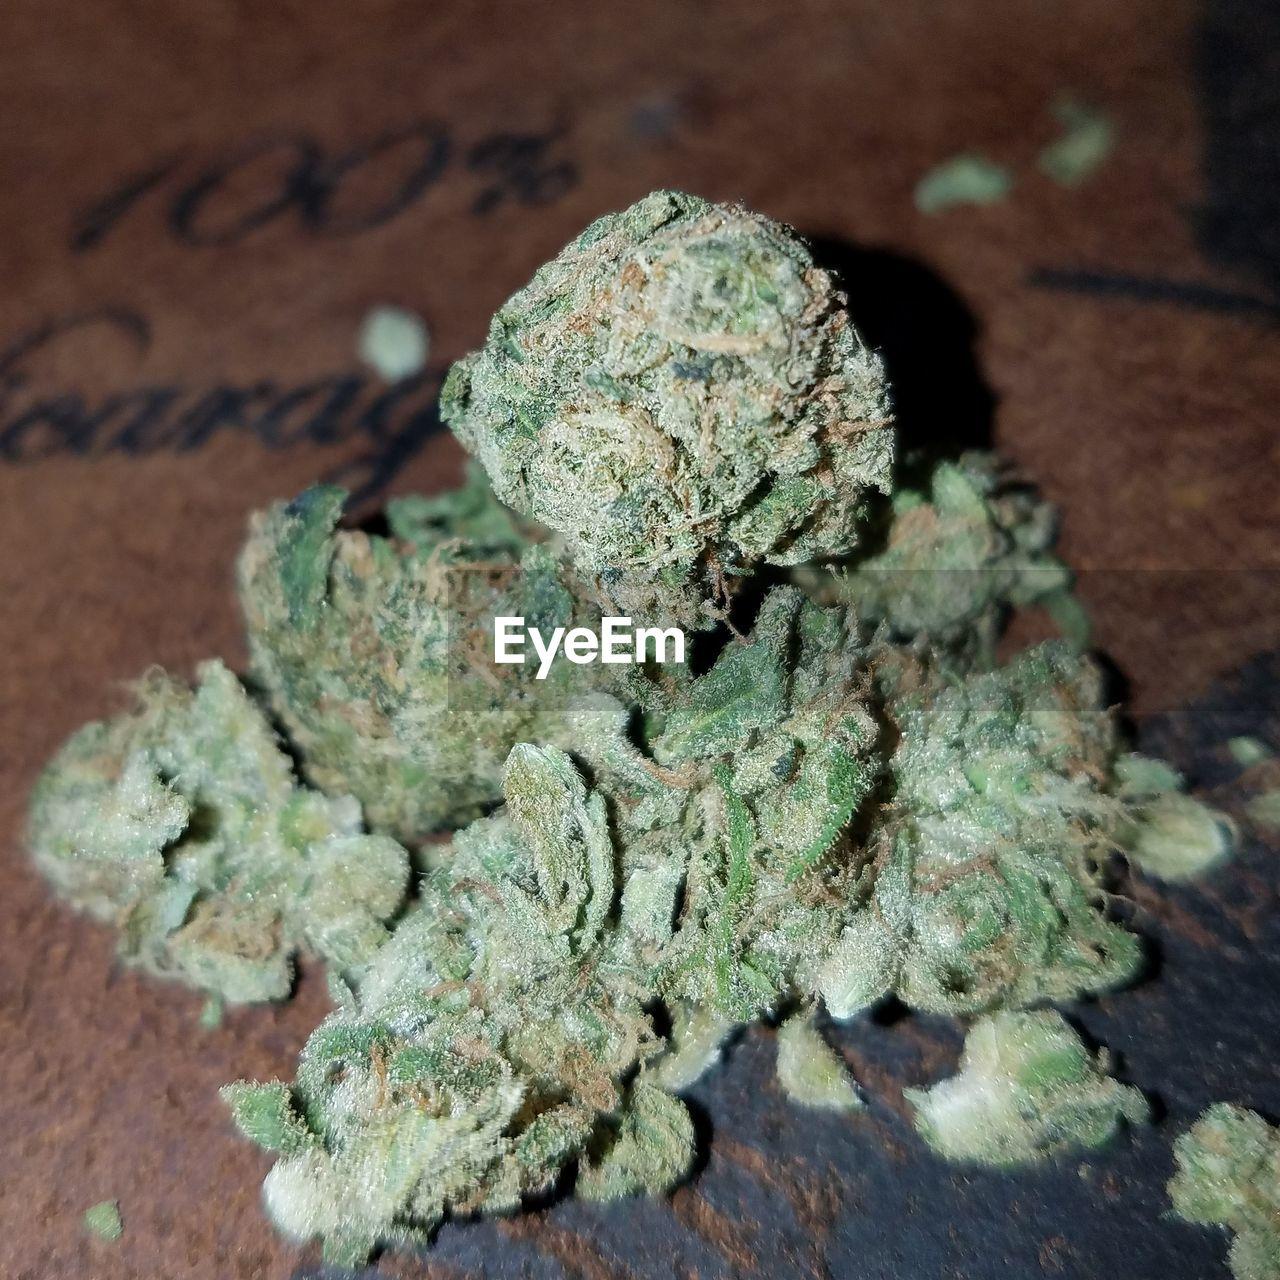 marijuana - herbal cannabis, close-up, table, cannabis plant, no people, indoors, day